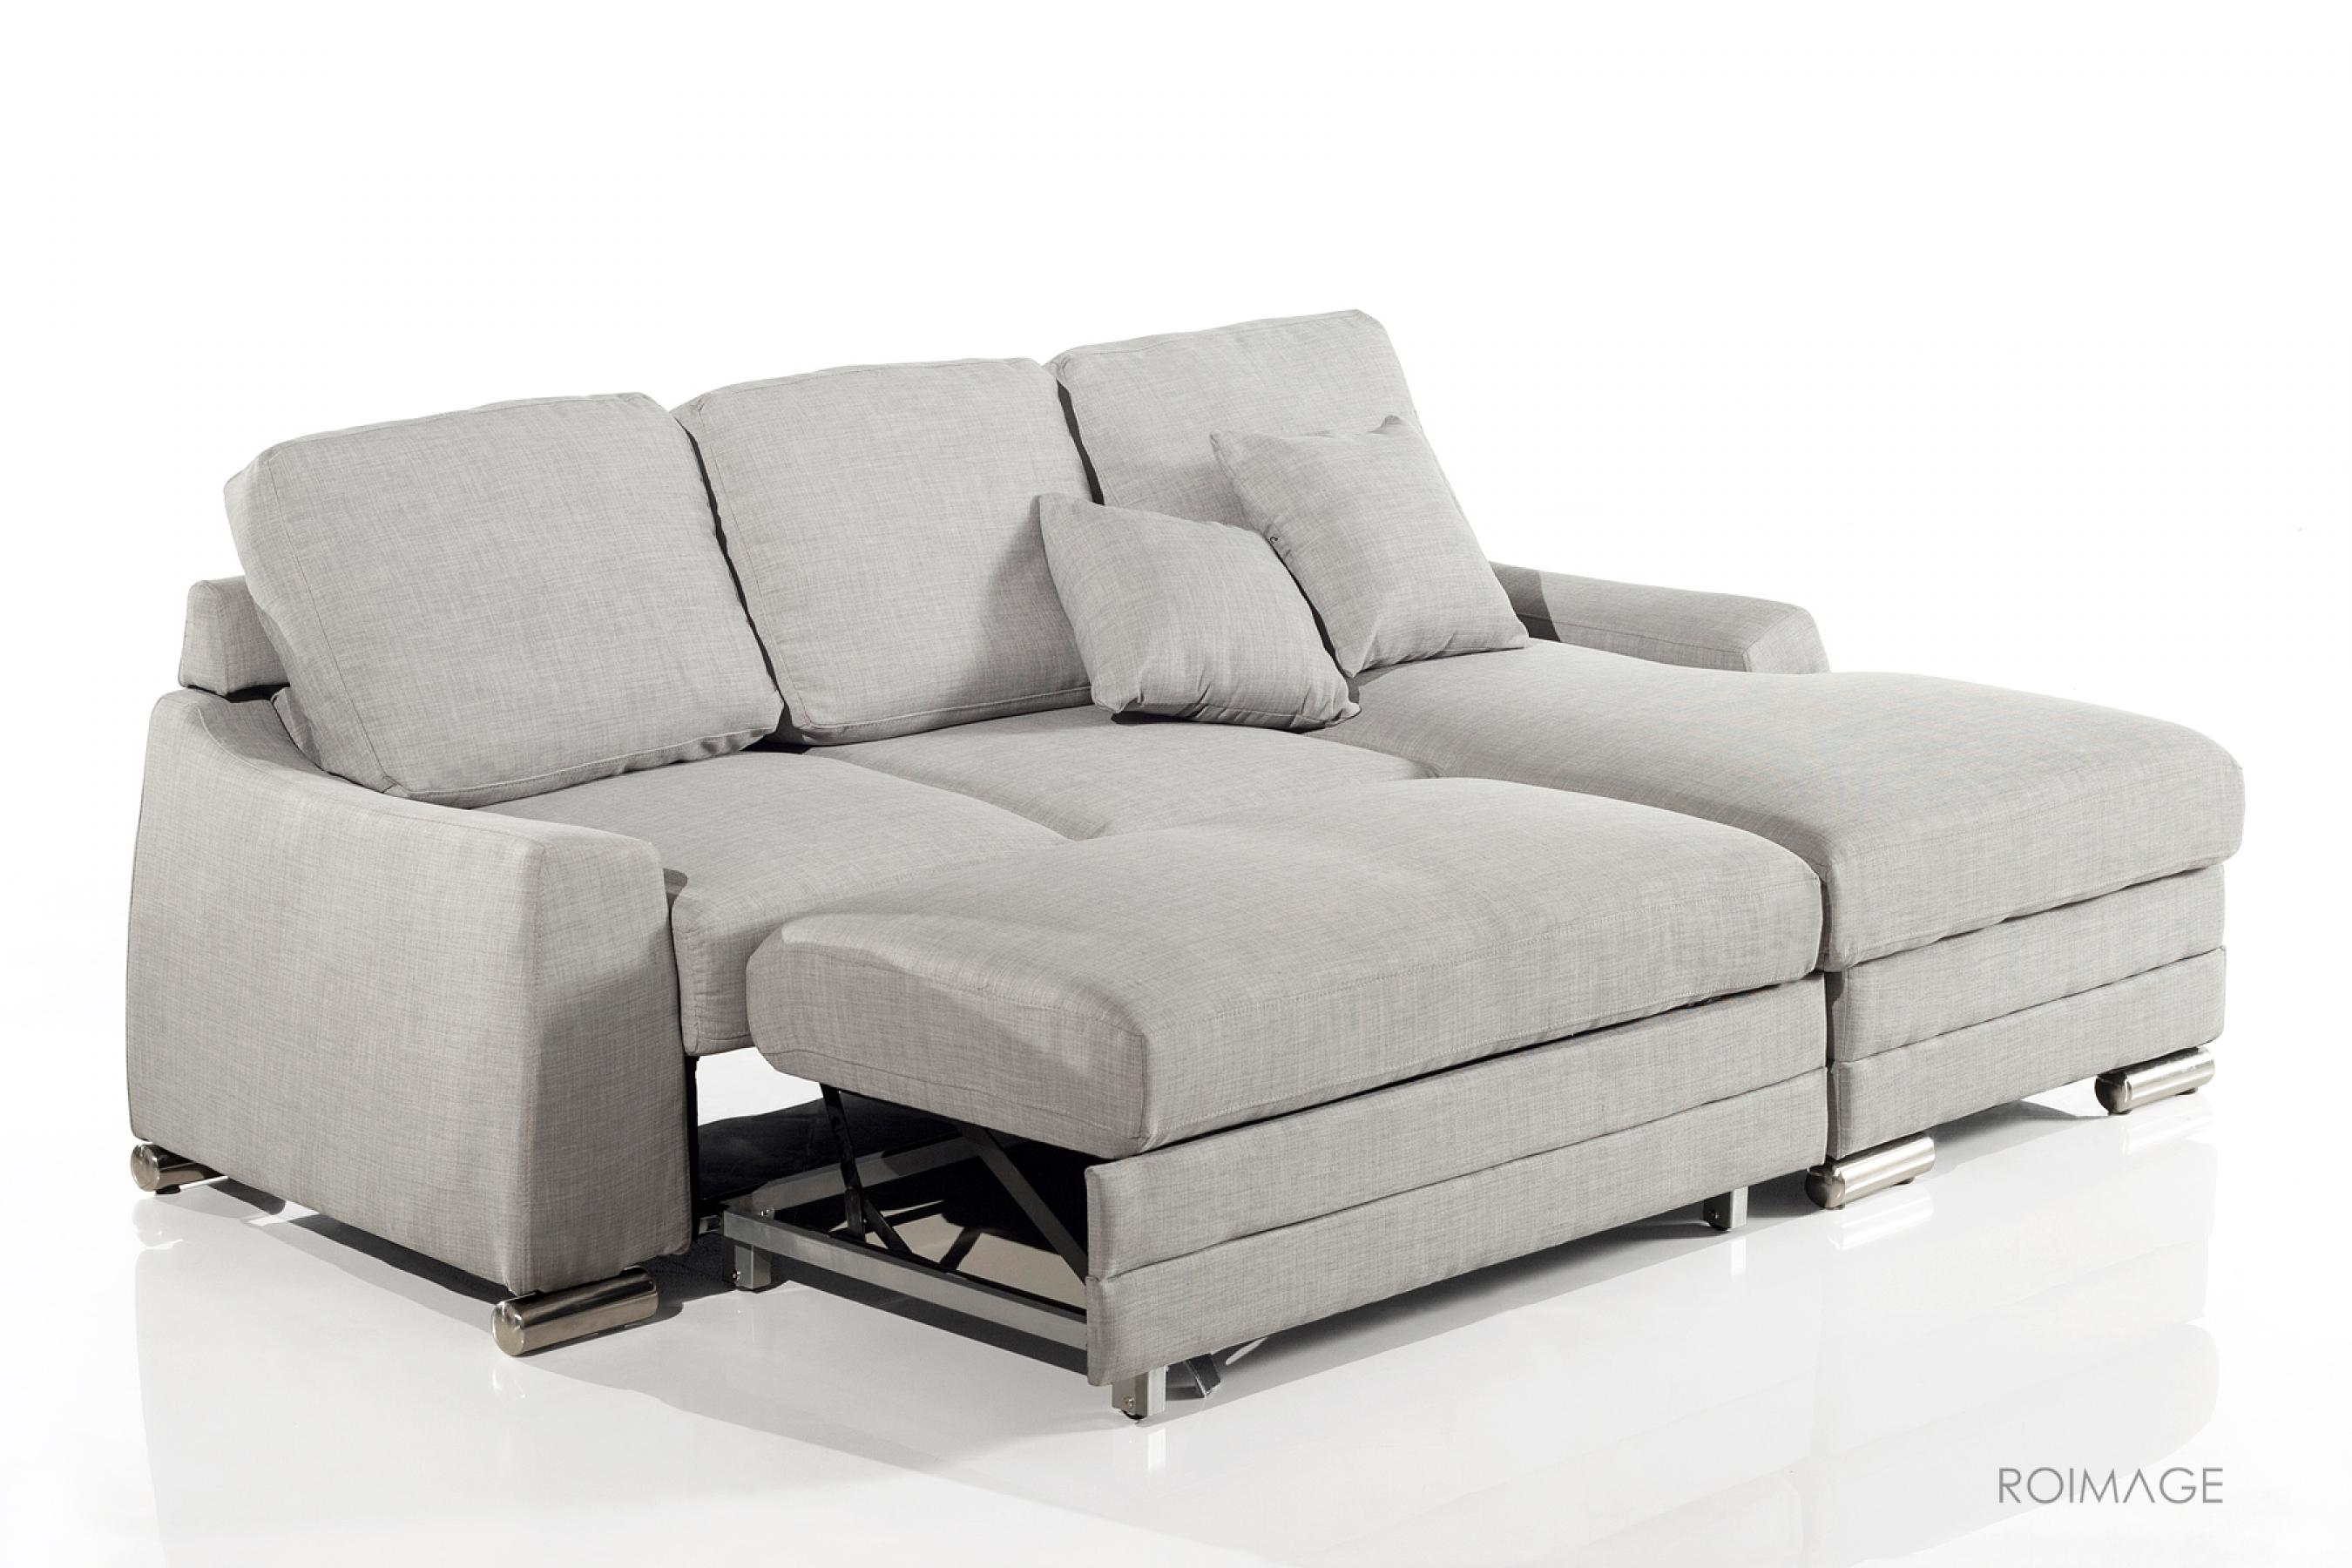 New Canape Convertible Avec Vrai Matelas